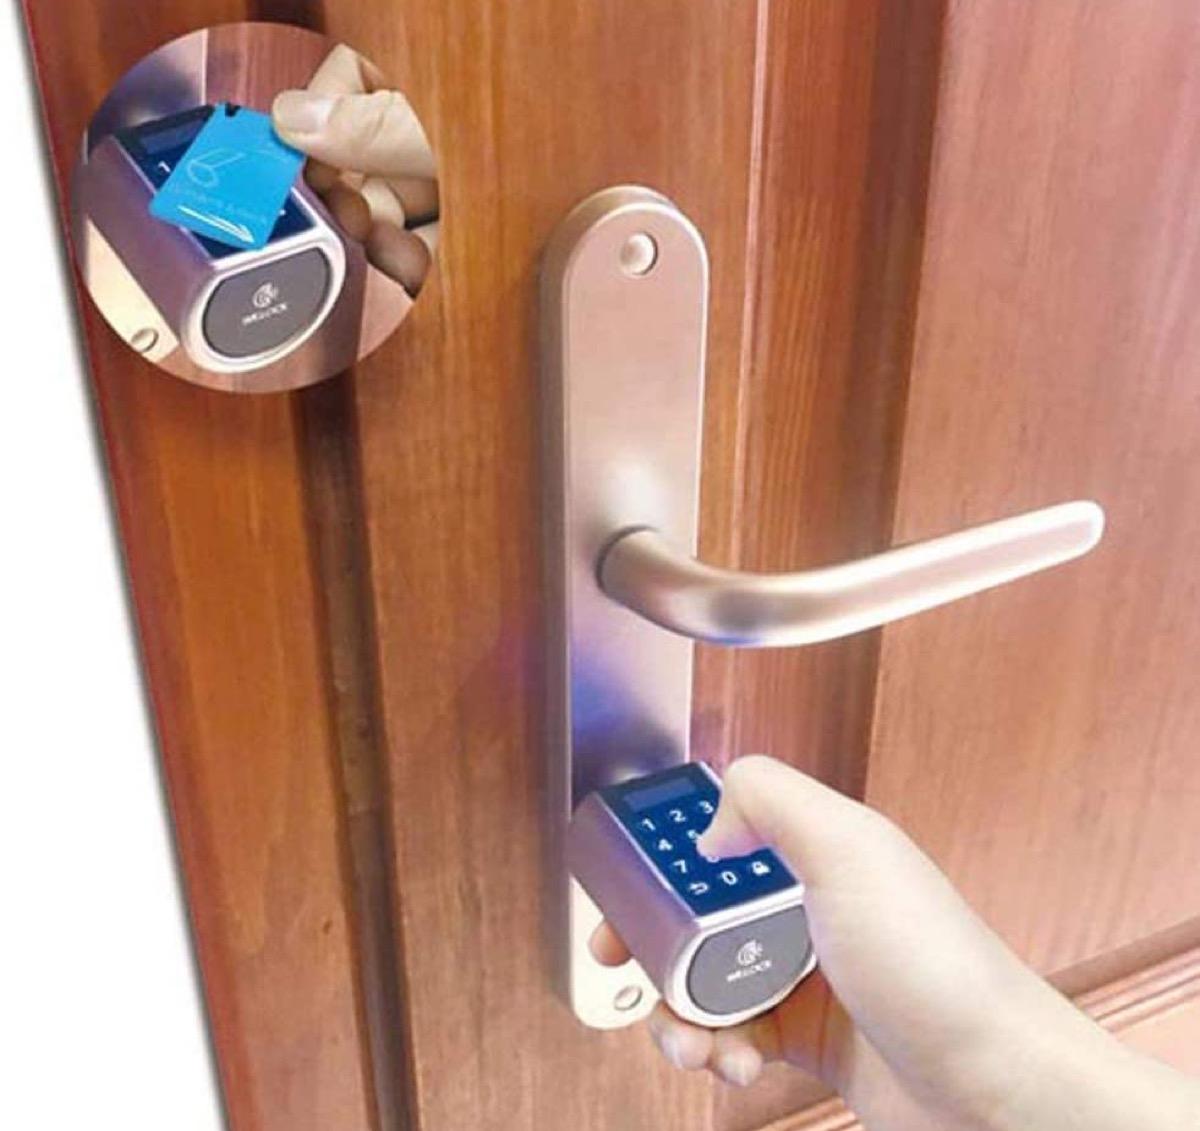 In sconto le serrature WE.LOCK con sblocco via impronta digitale, RFID, Bluetooth o PIN